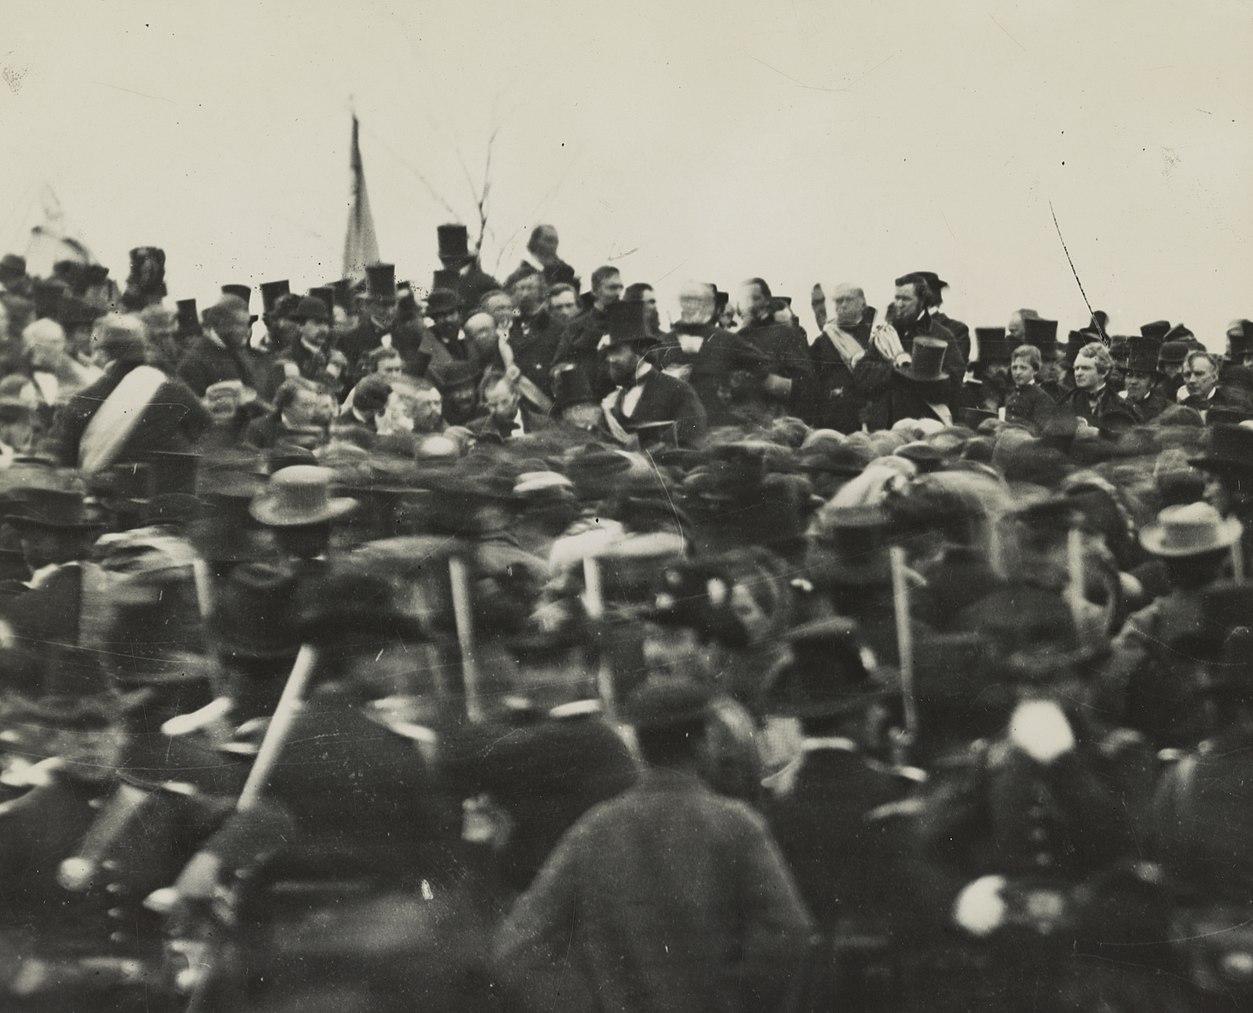 Battle of Gettysburg ends